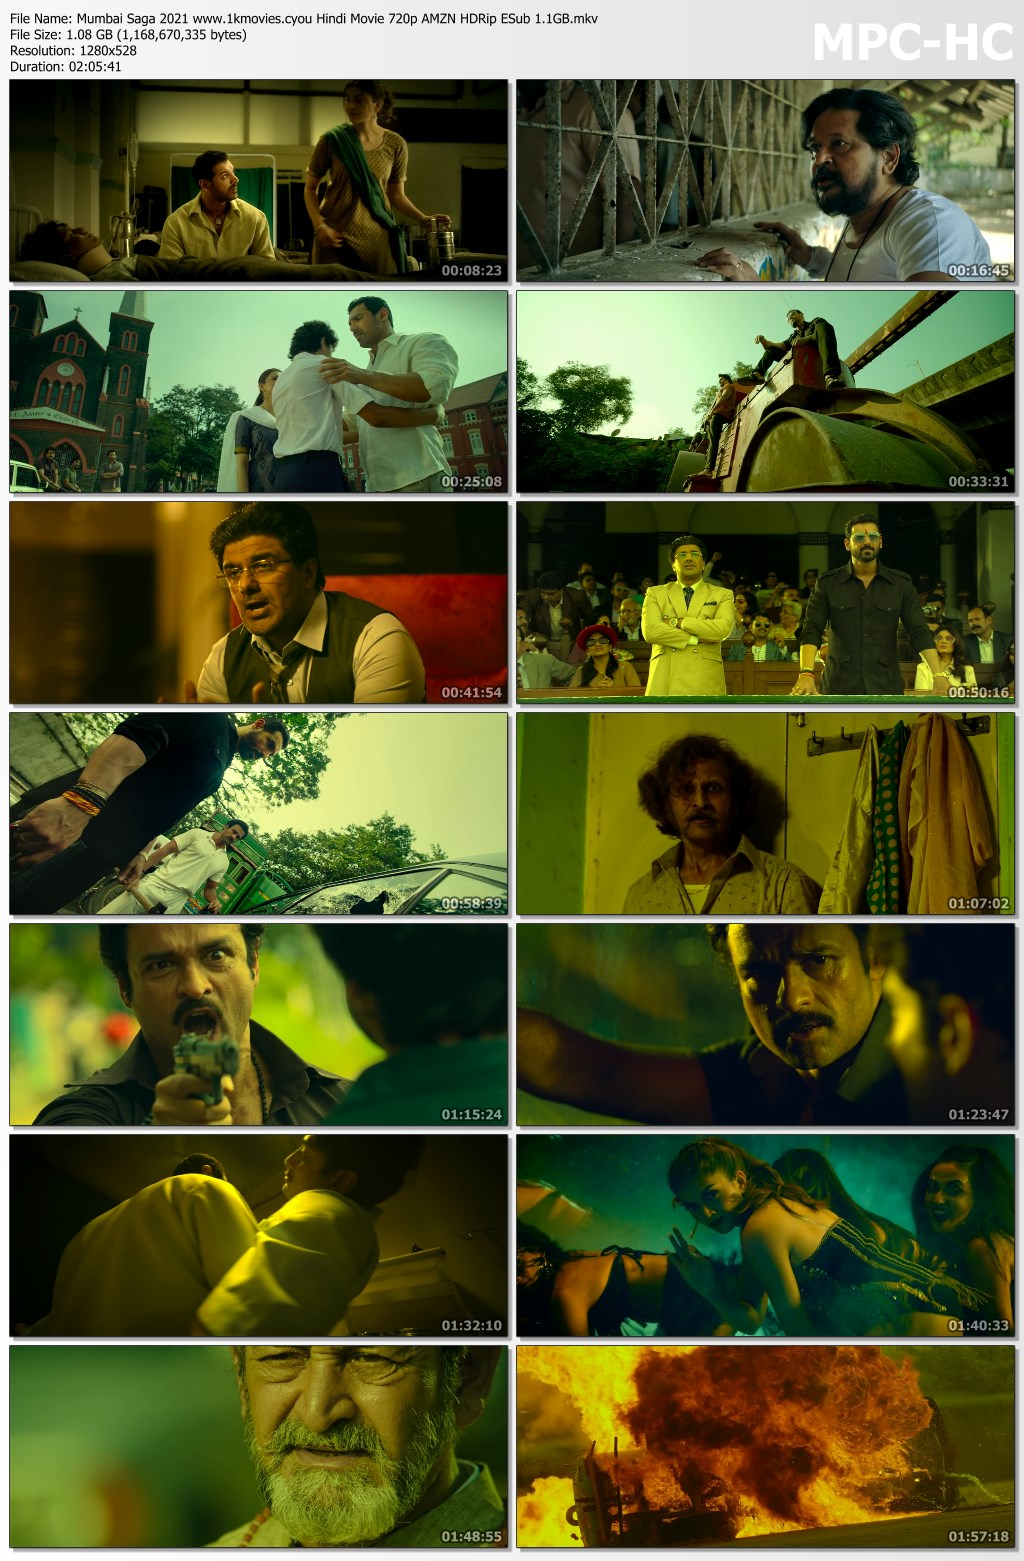 Mumbai Saga 2021 Hindi Movie Download Full HD